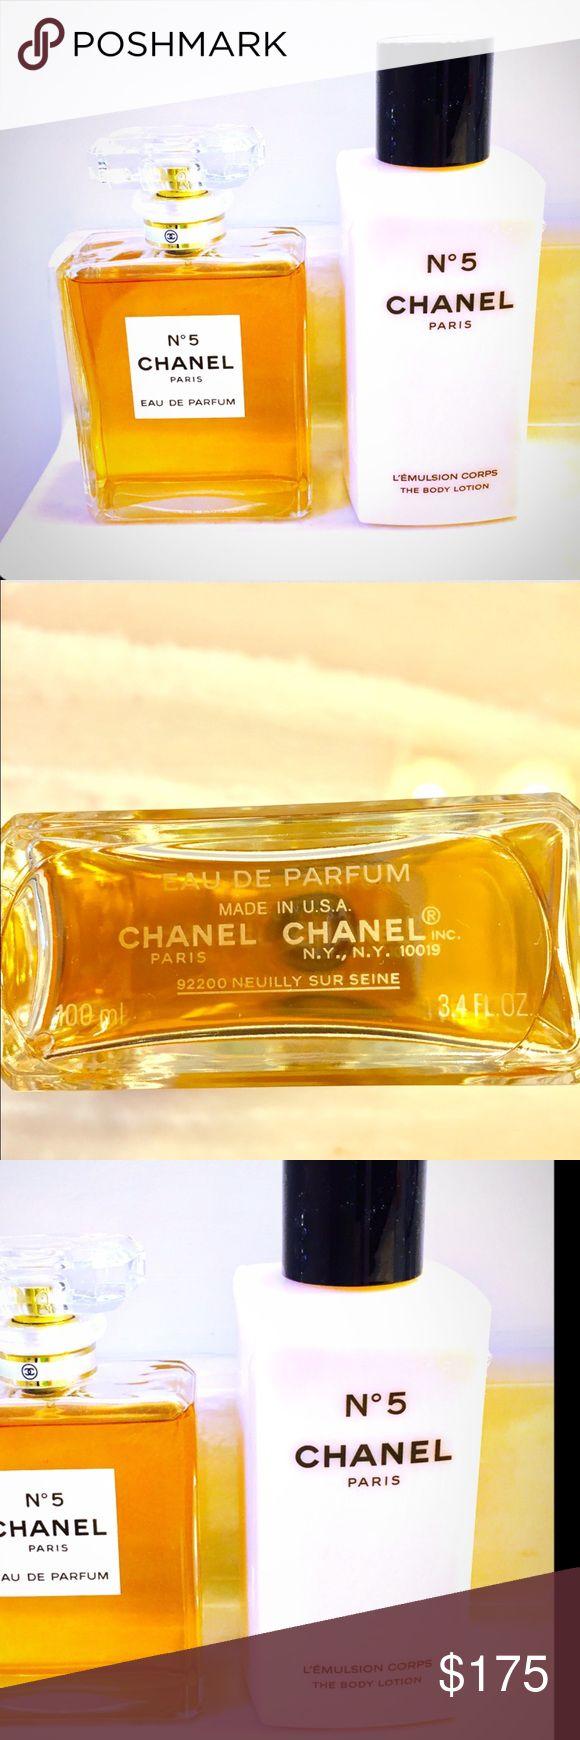 chanel 5 gift set. chanel #5 gift set chanel 5